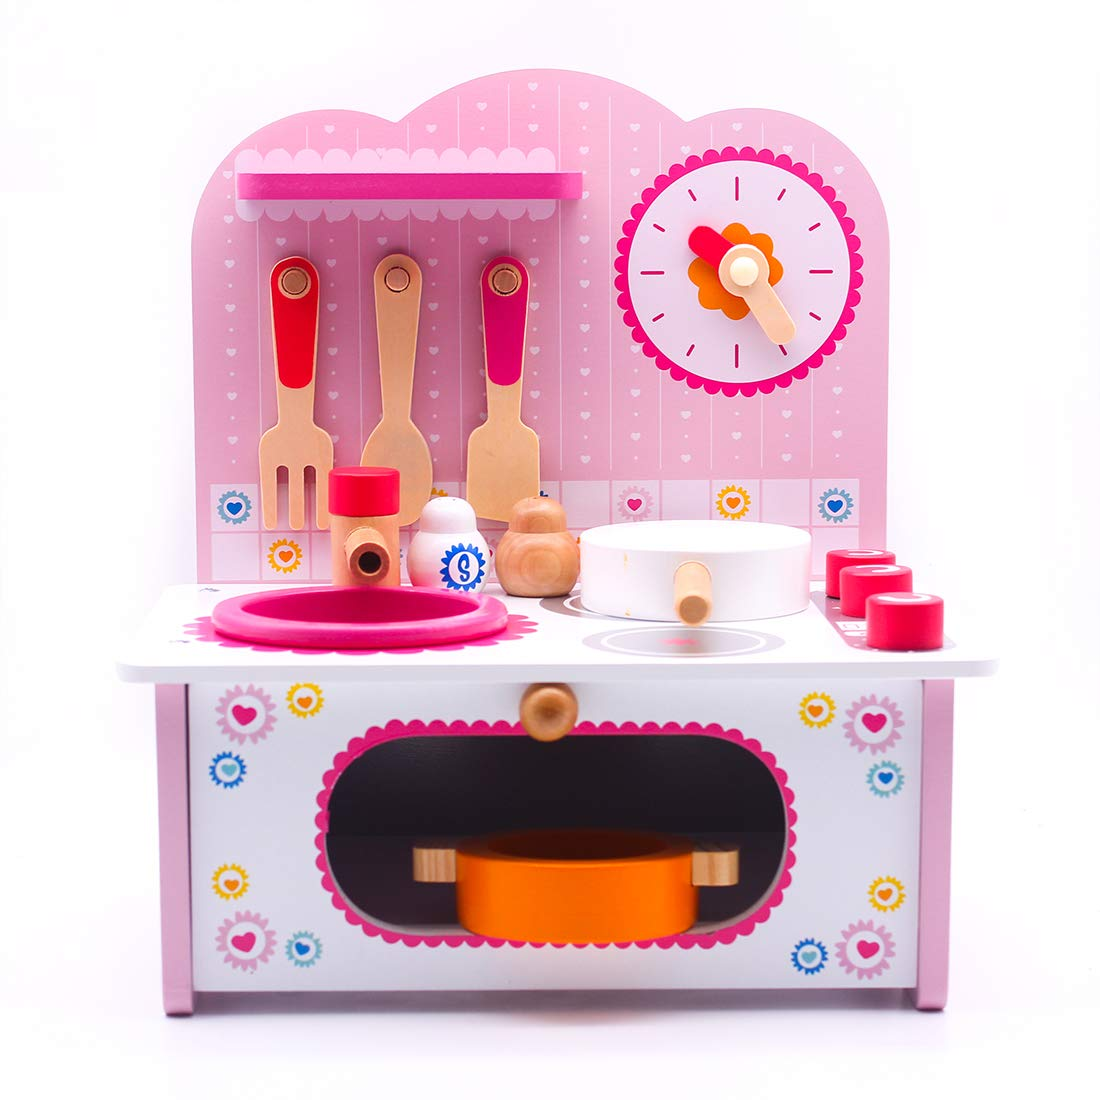 Amazon.com: donado Play Kitchen Set Toy Kitchen Playsets of ...